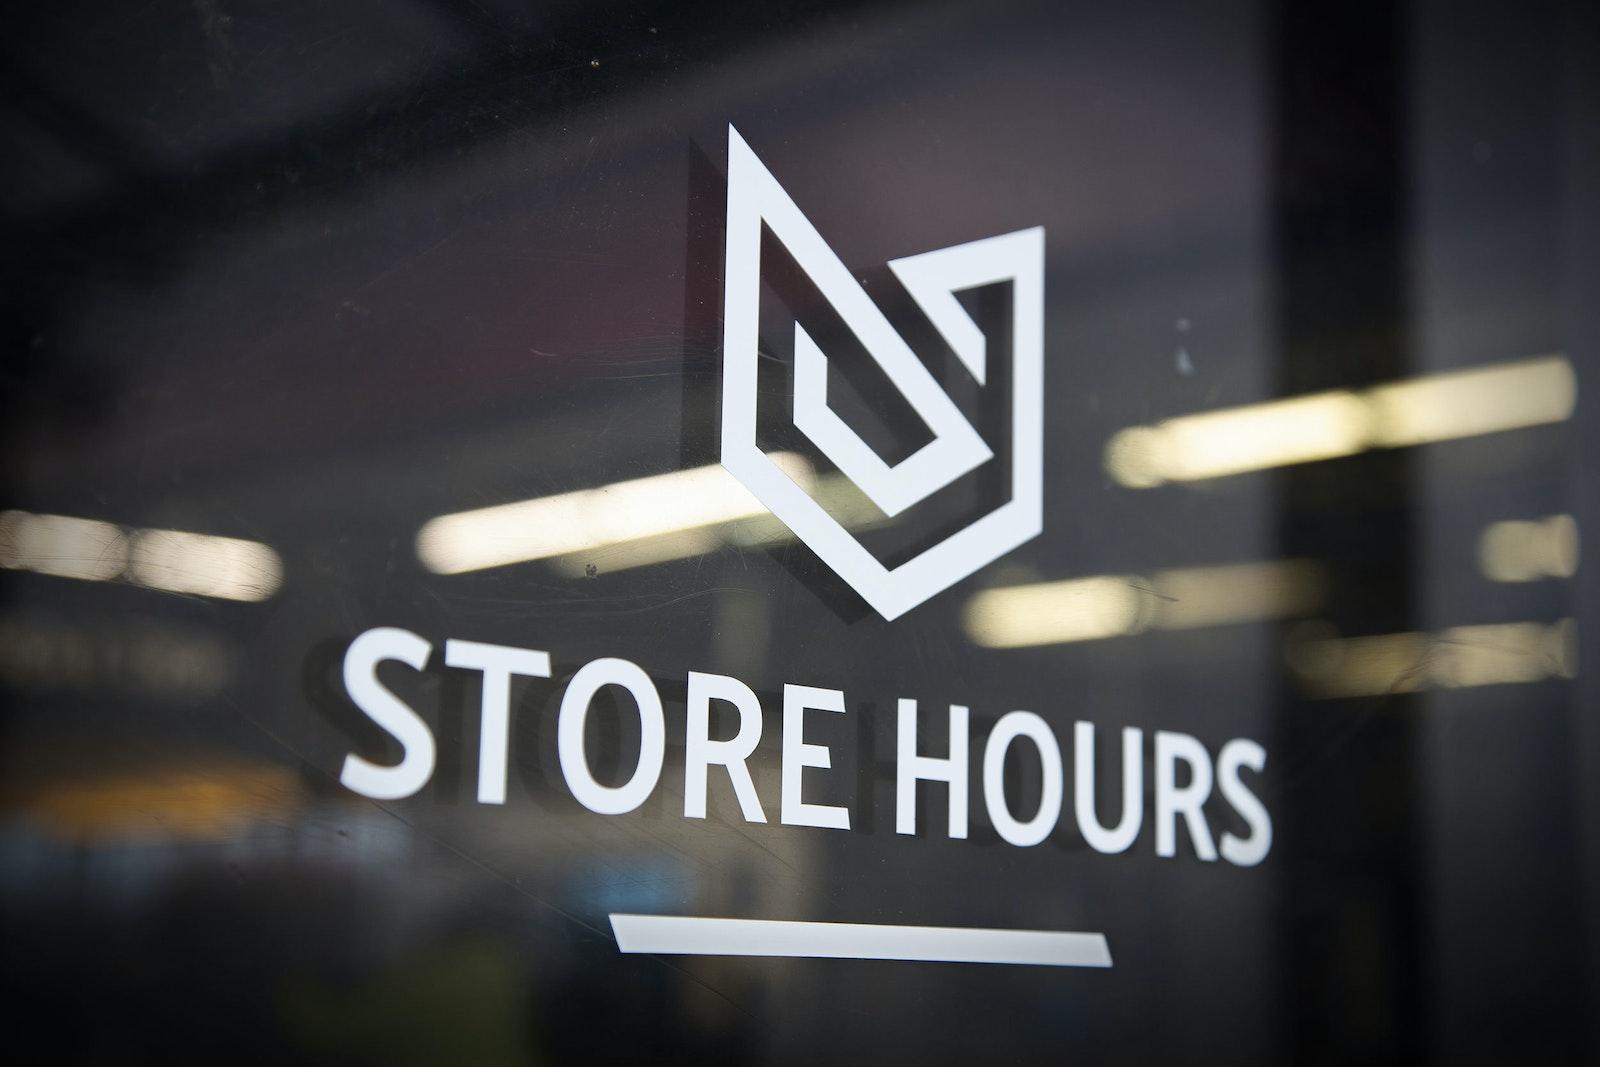 Coremark Store Hours copy